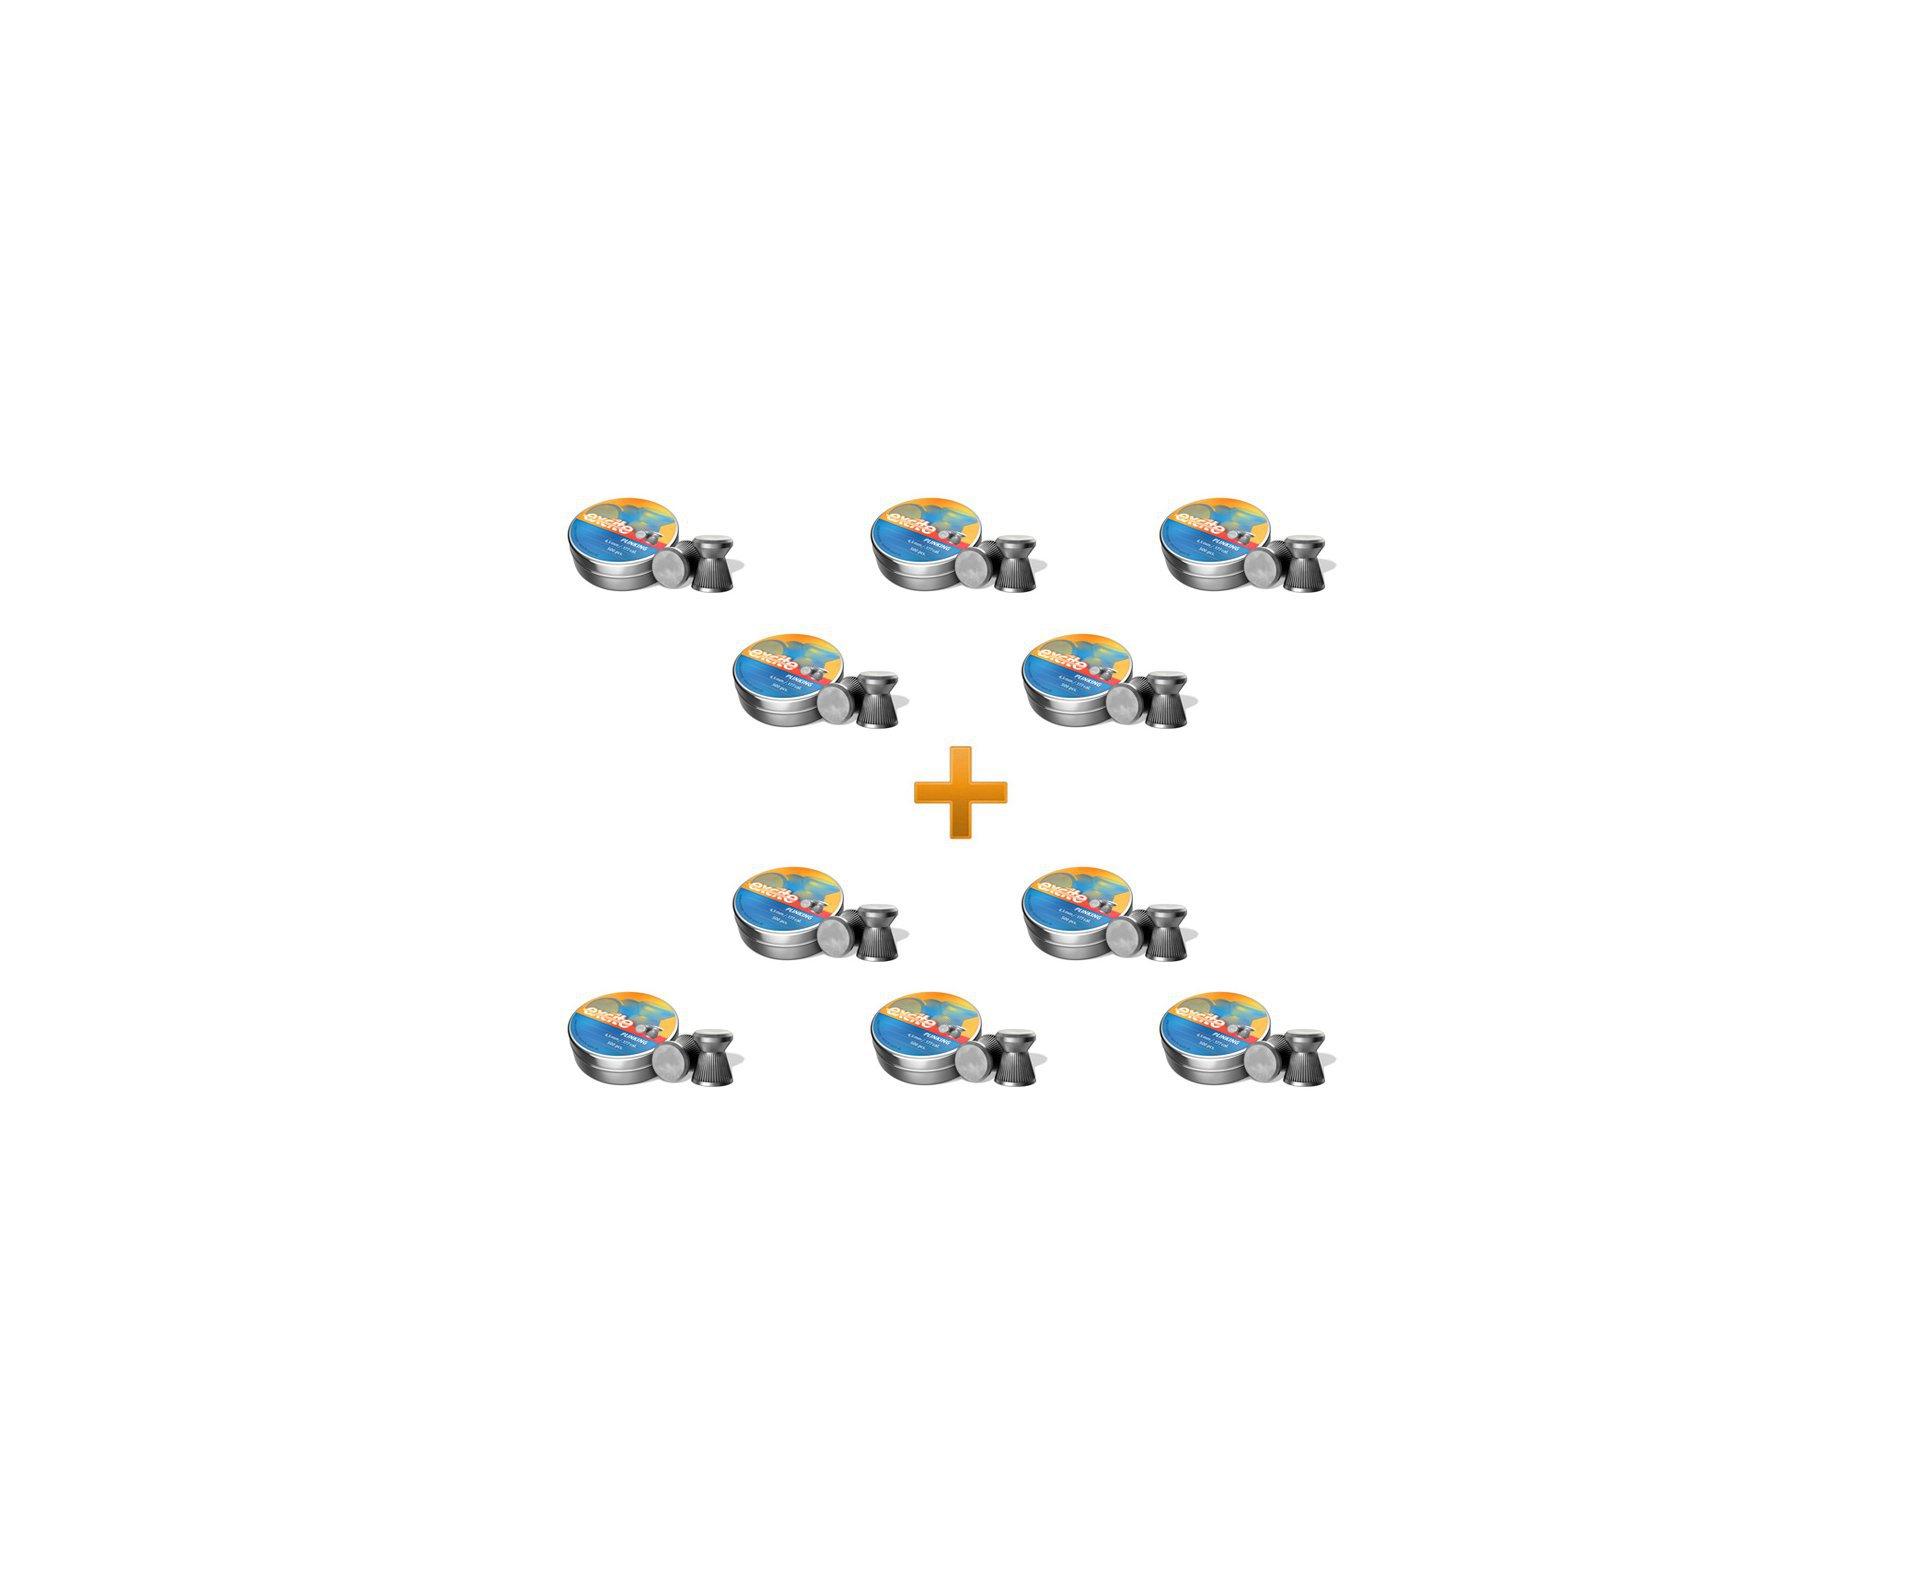 Kit Chumbinho Econômico H&n Excite Plinking Cal 4,5 Mm - 10 Latas C/ 500 Unds Cada